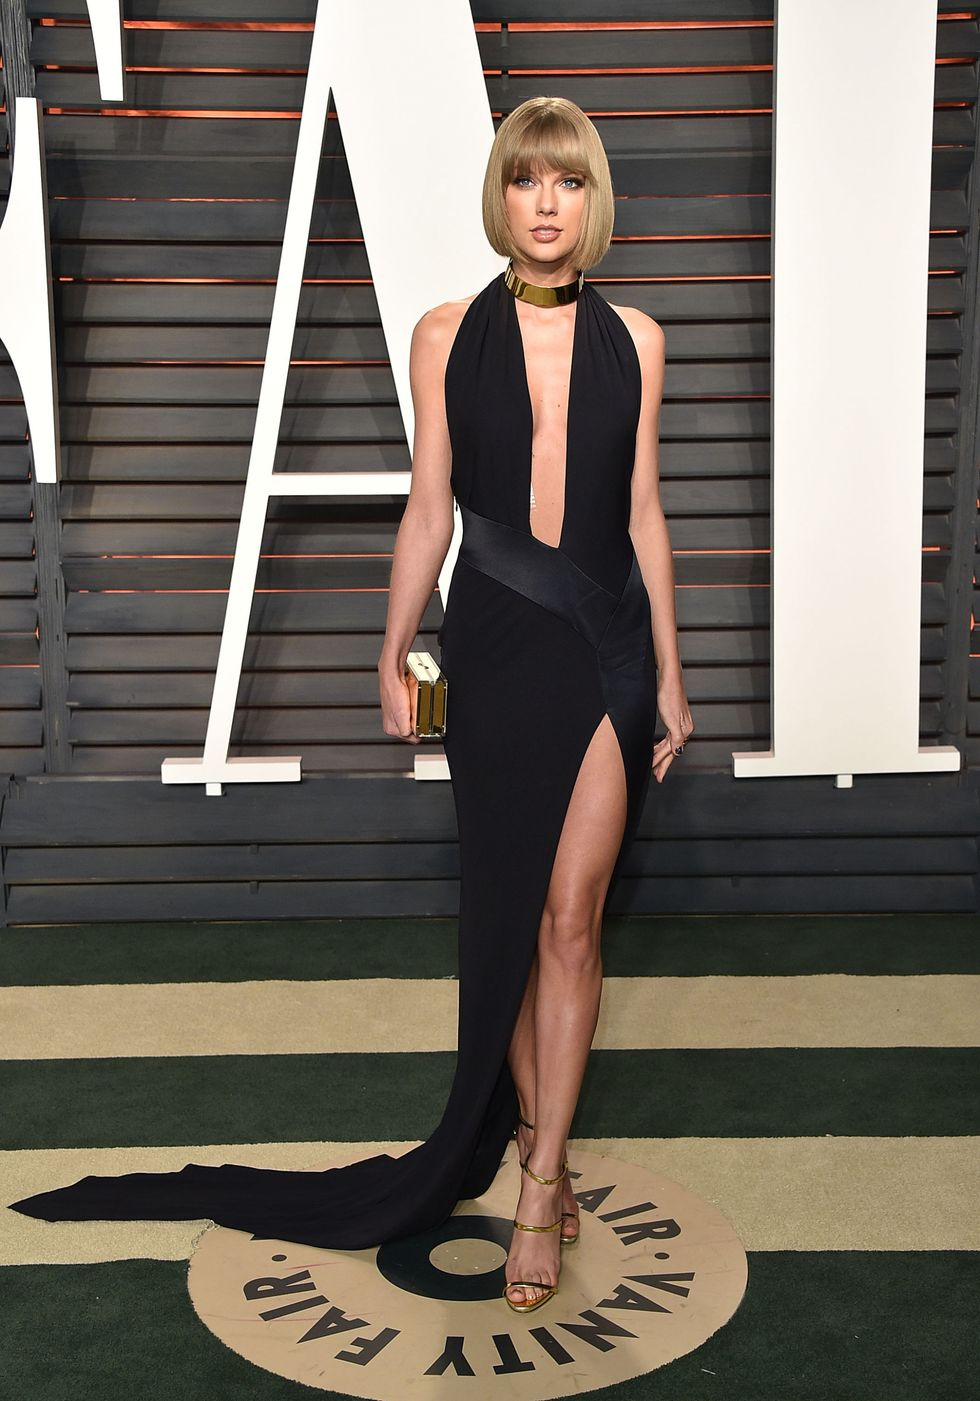 Transformasi Gaya Taylor Swift, Dulunya Manis kini Makin Seksi